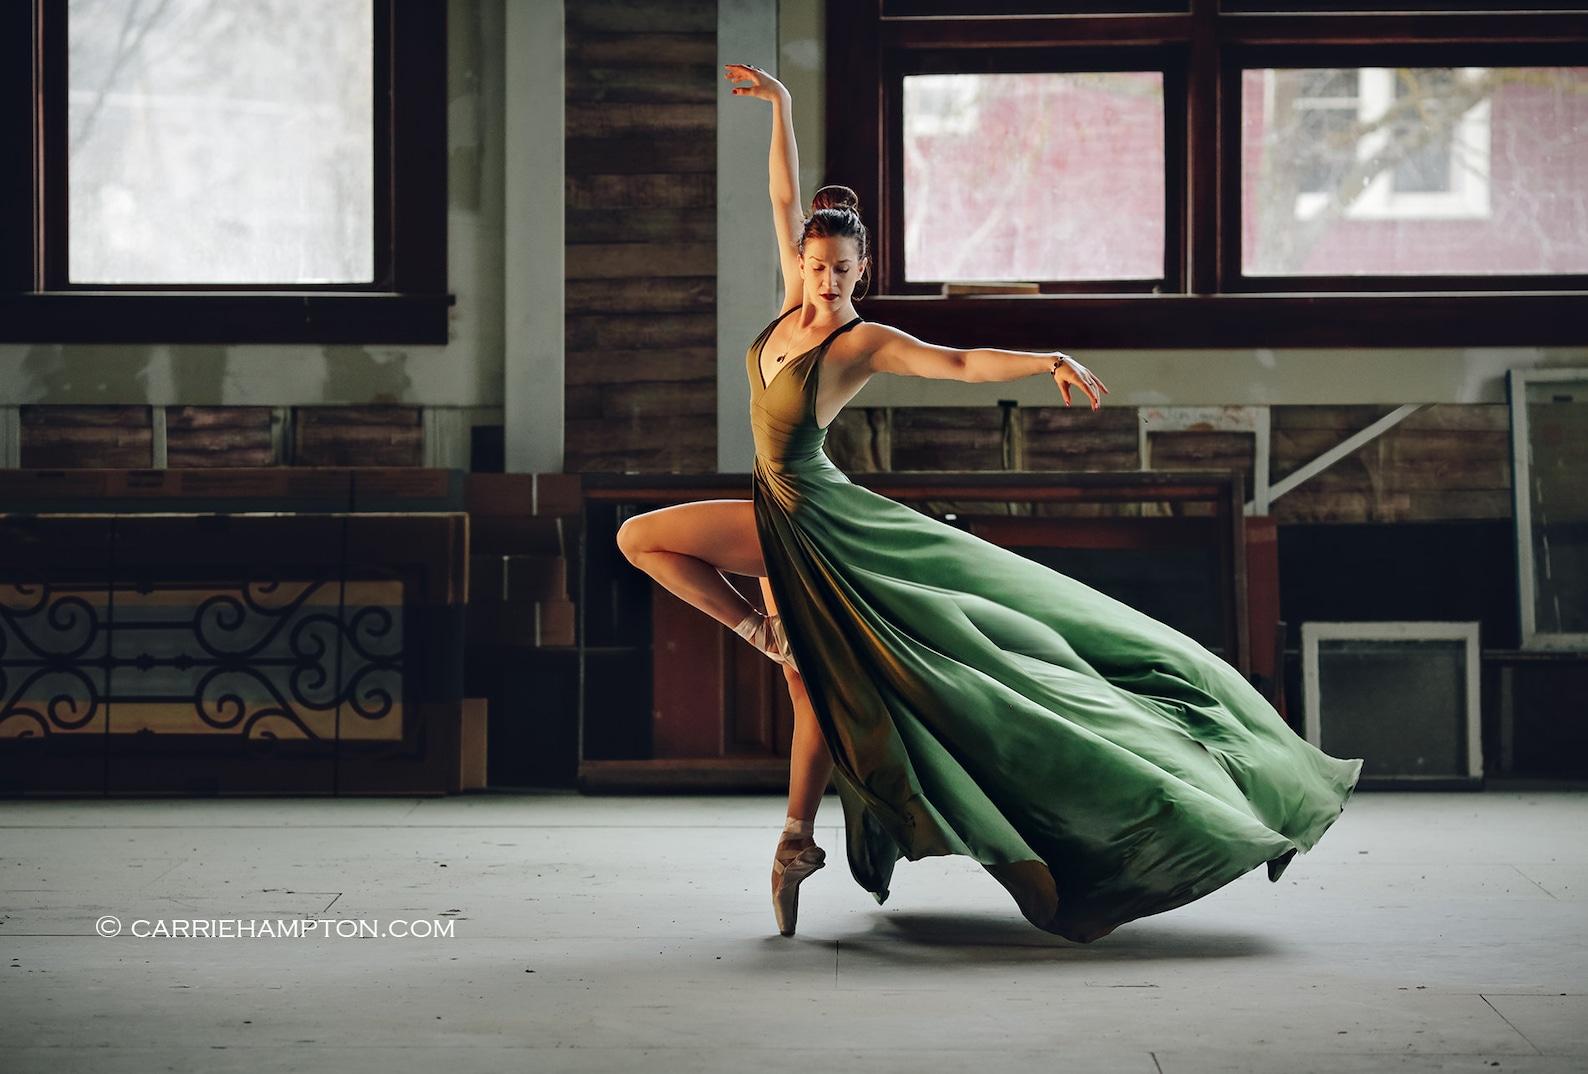 ballet art girls room, green dress picture, ballet idaho ballerina, dancer dance poster, pointe shoe on point decor